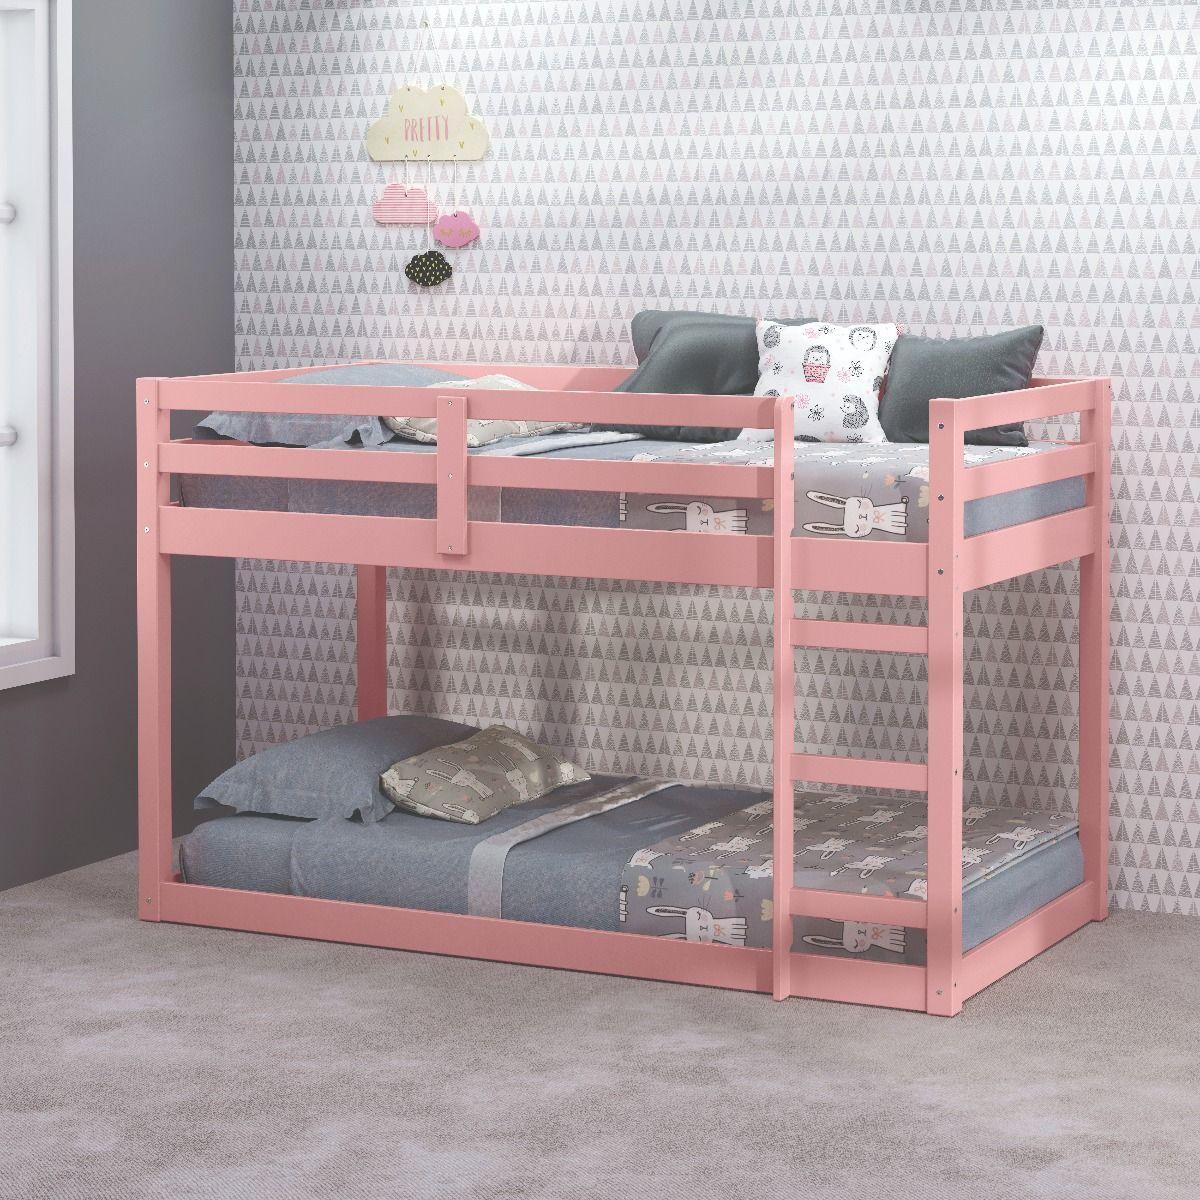 Acme BD00768 Mack & Milo abinash gaston II pink finish wood loft bunk bed set